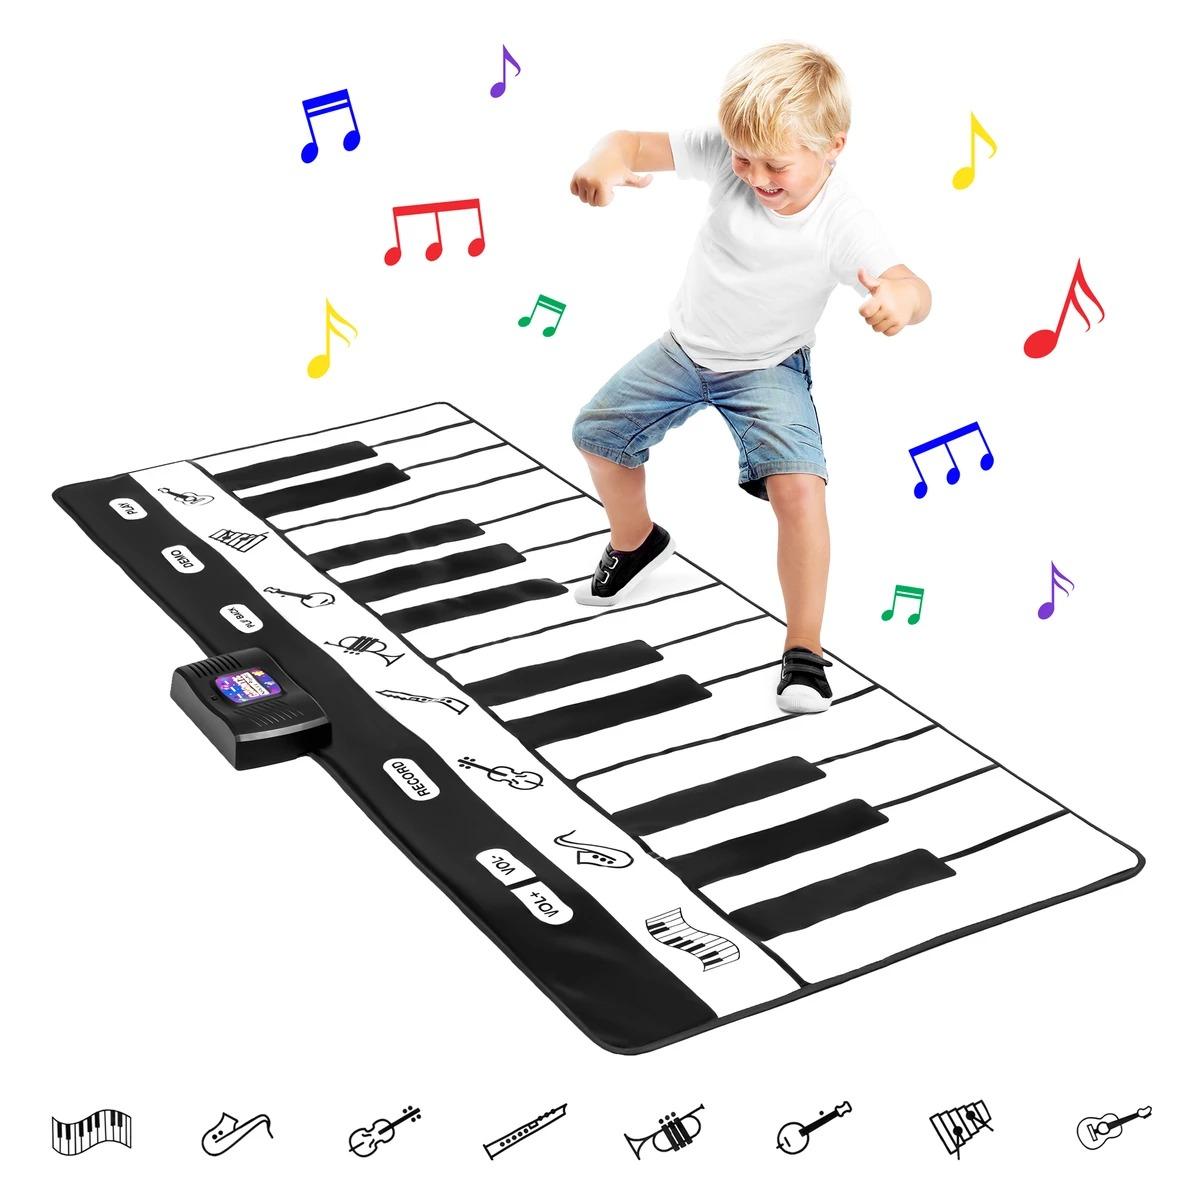 ihocon: Giant Piano Keyboard Playmat w/ 8 Instrument Settings - Black/White 大型鋼琴鍵盤遊戲墊